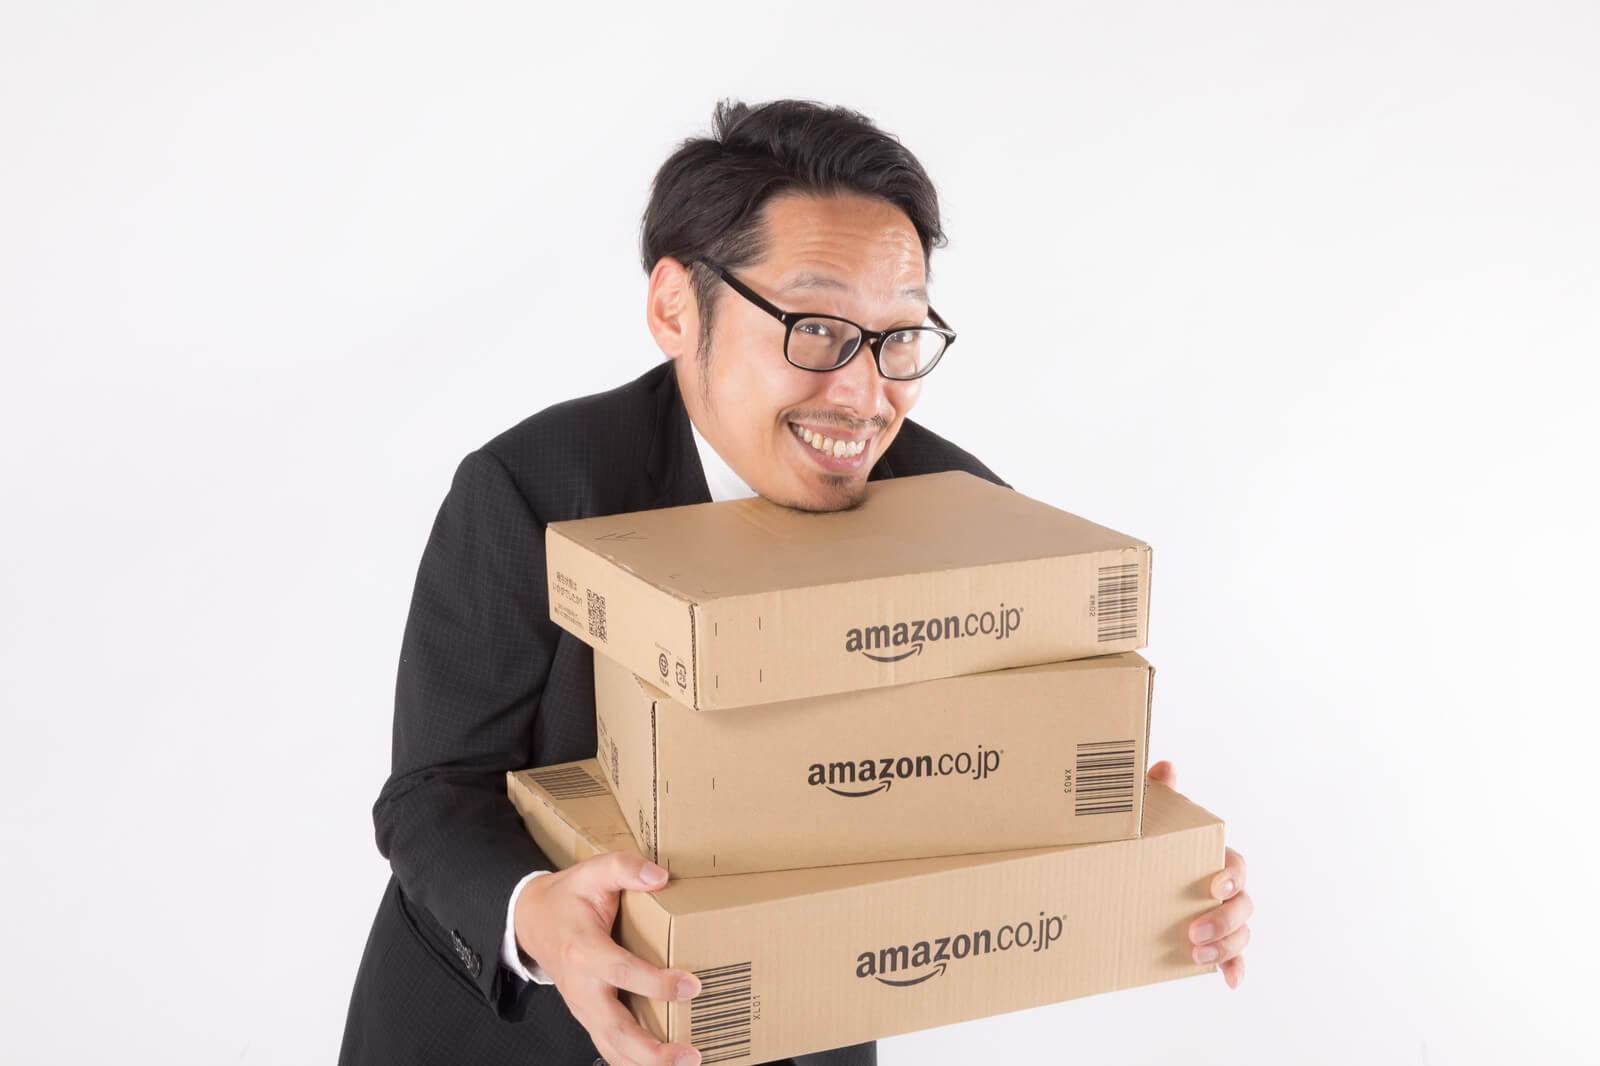 Amazonの段ボールをたくさん持つ男性